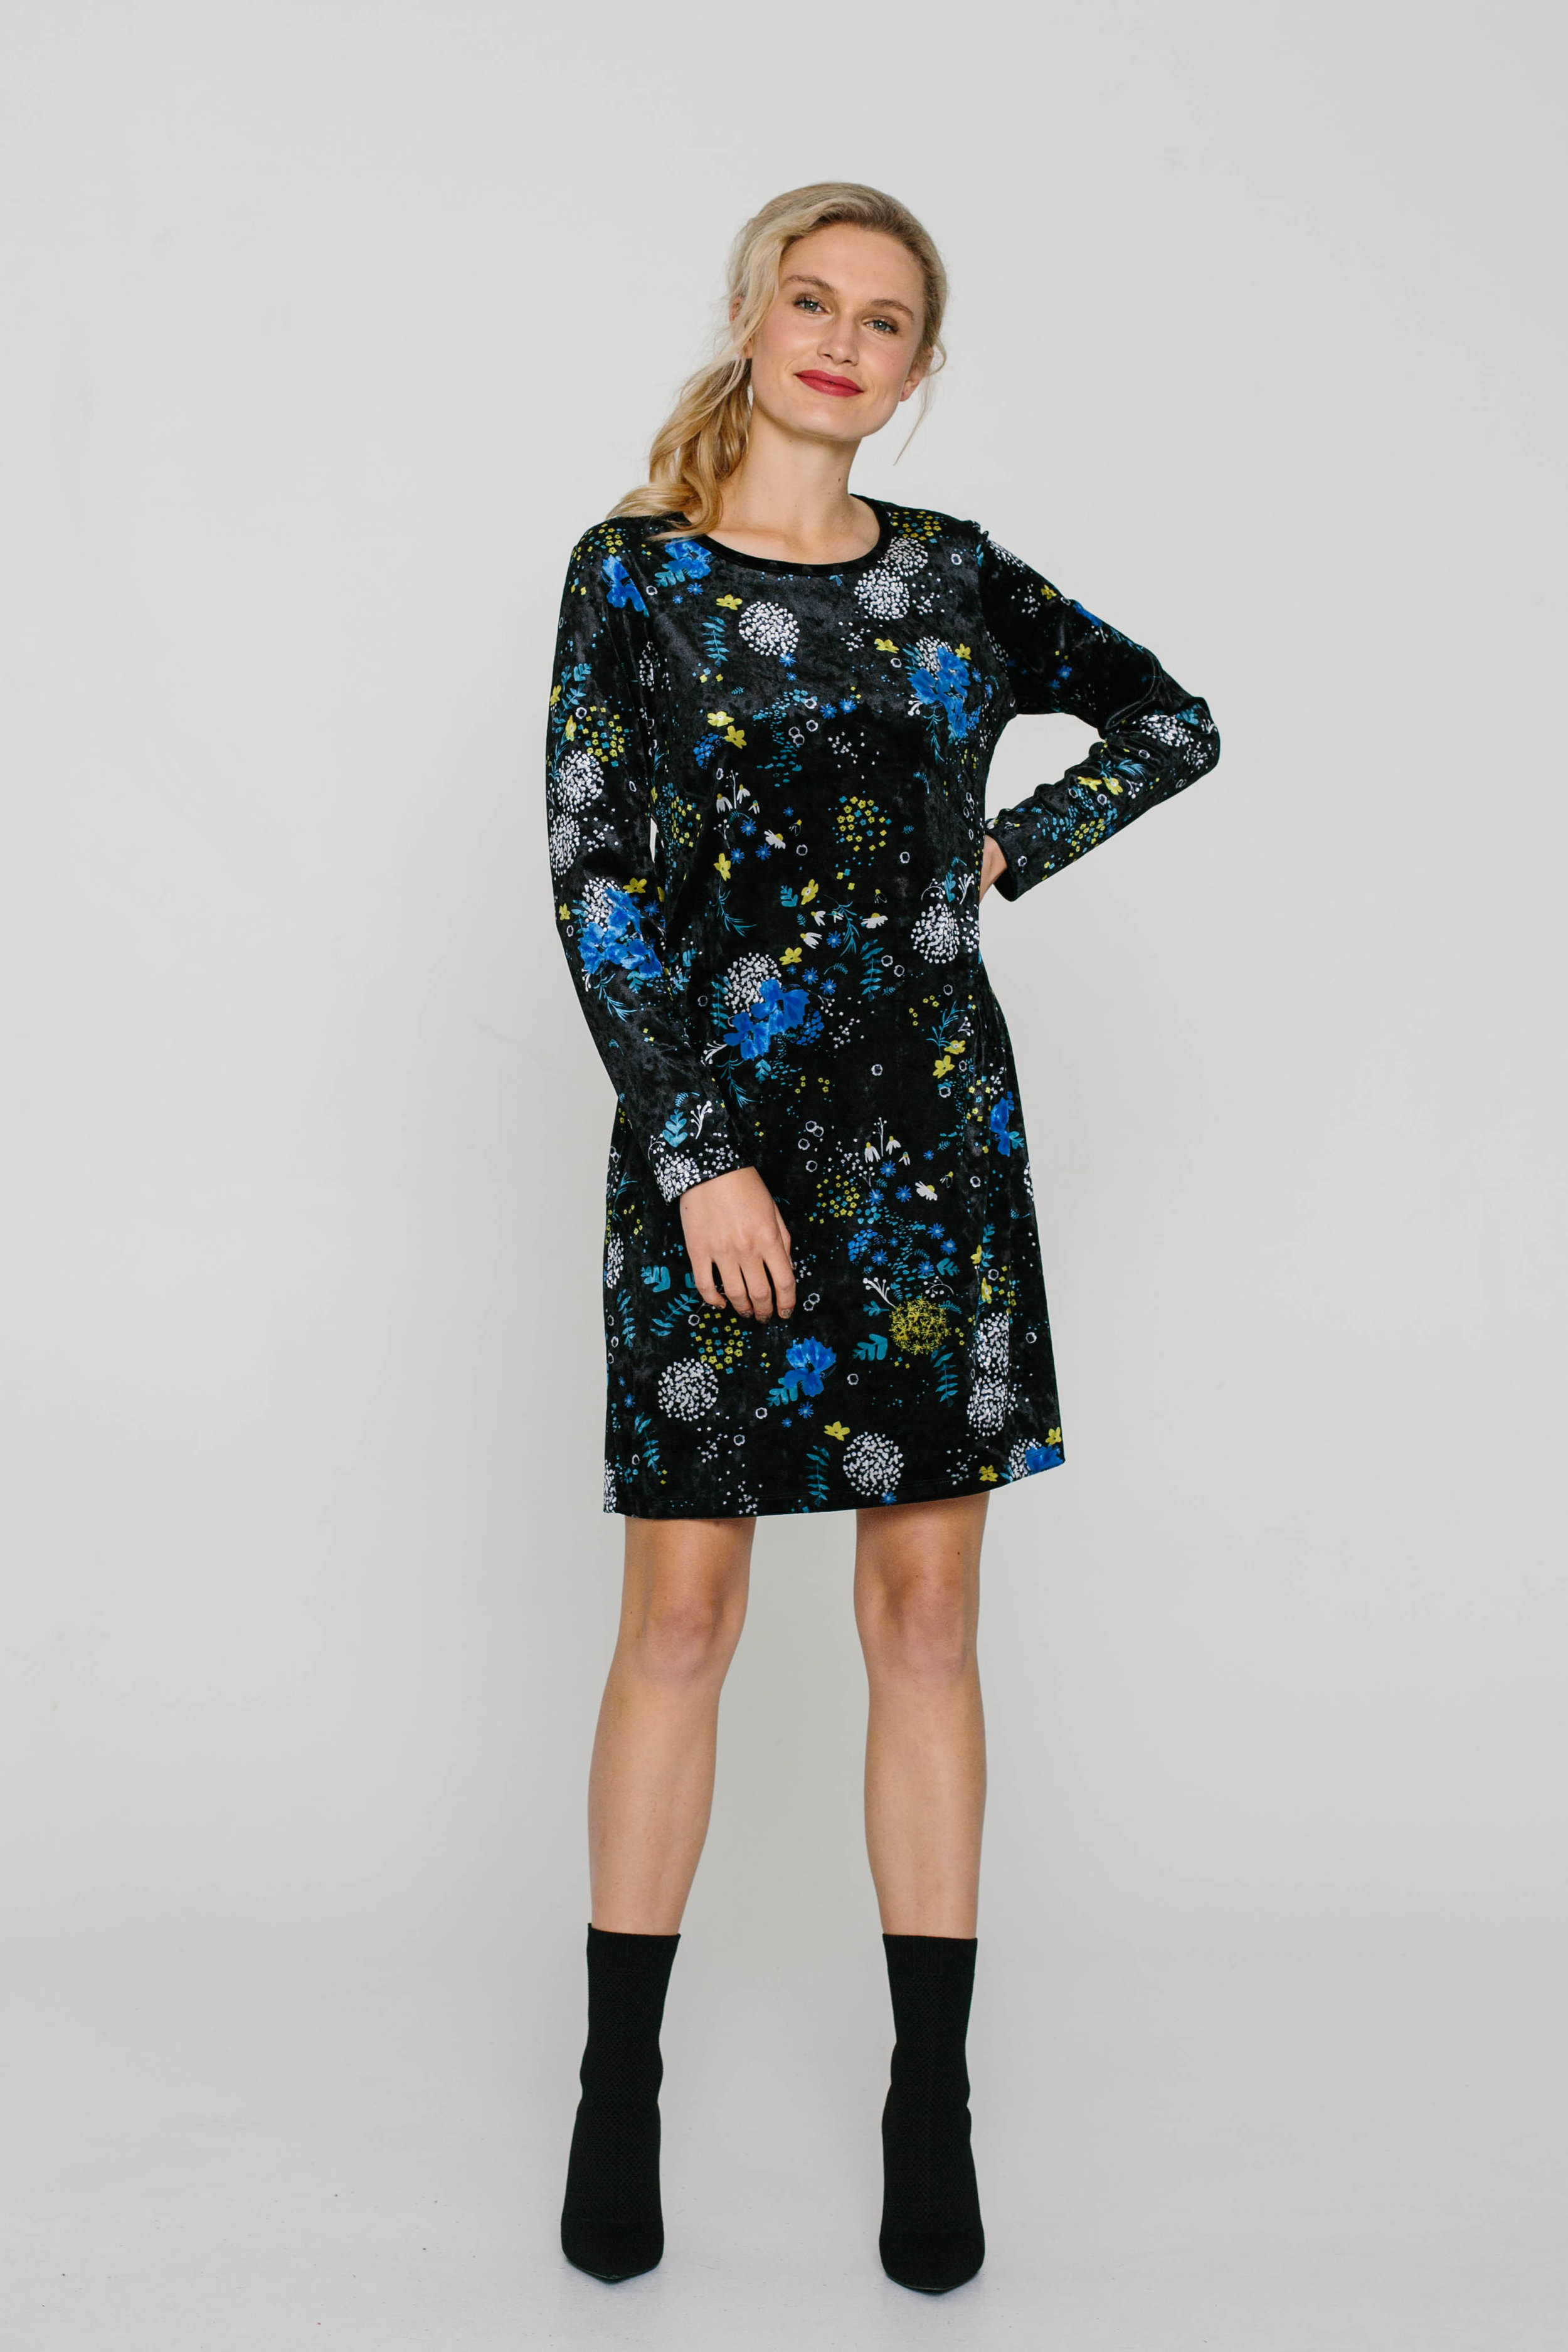 5979W Blondie Dress Garden Velvet